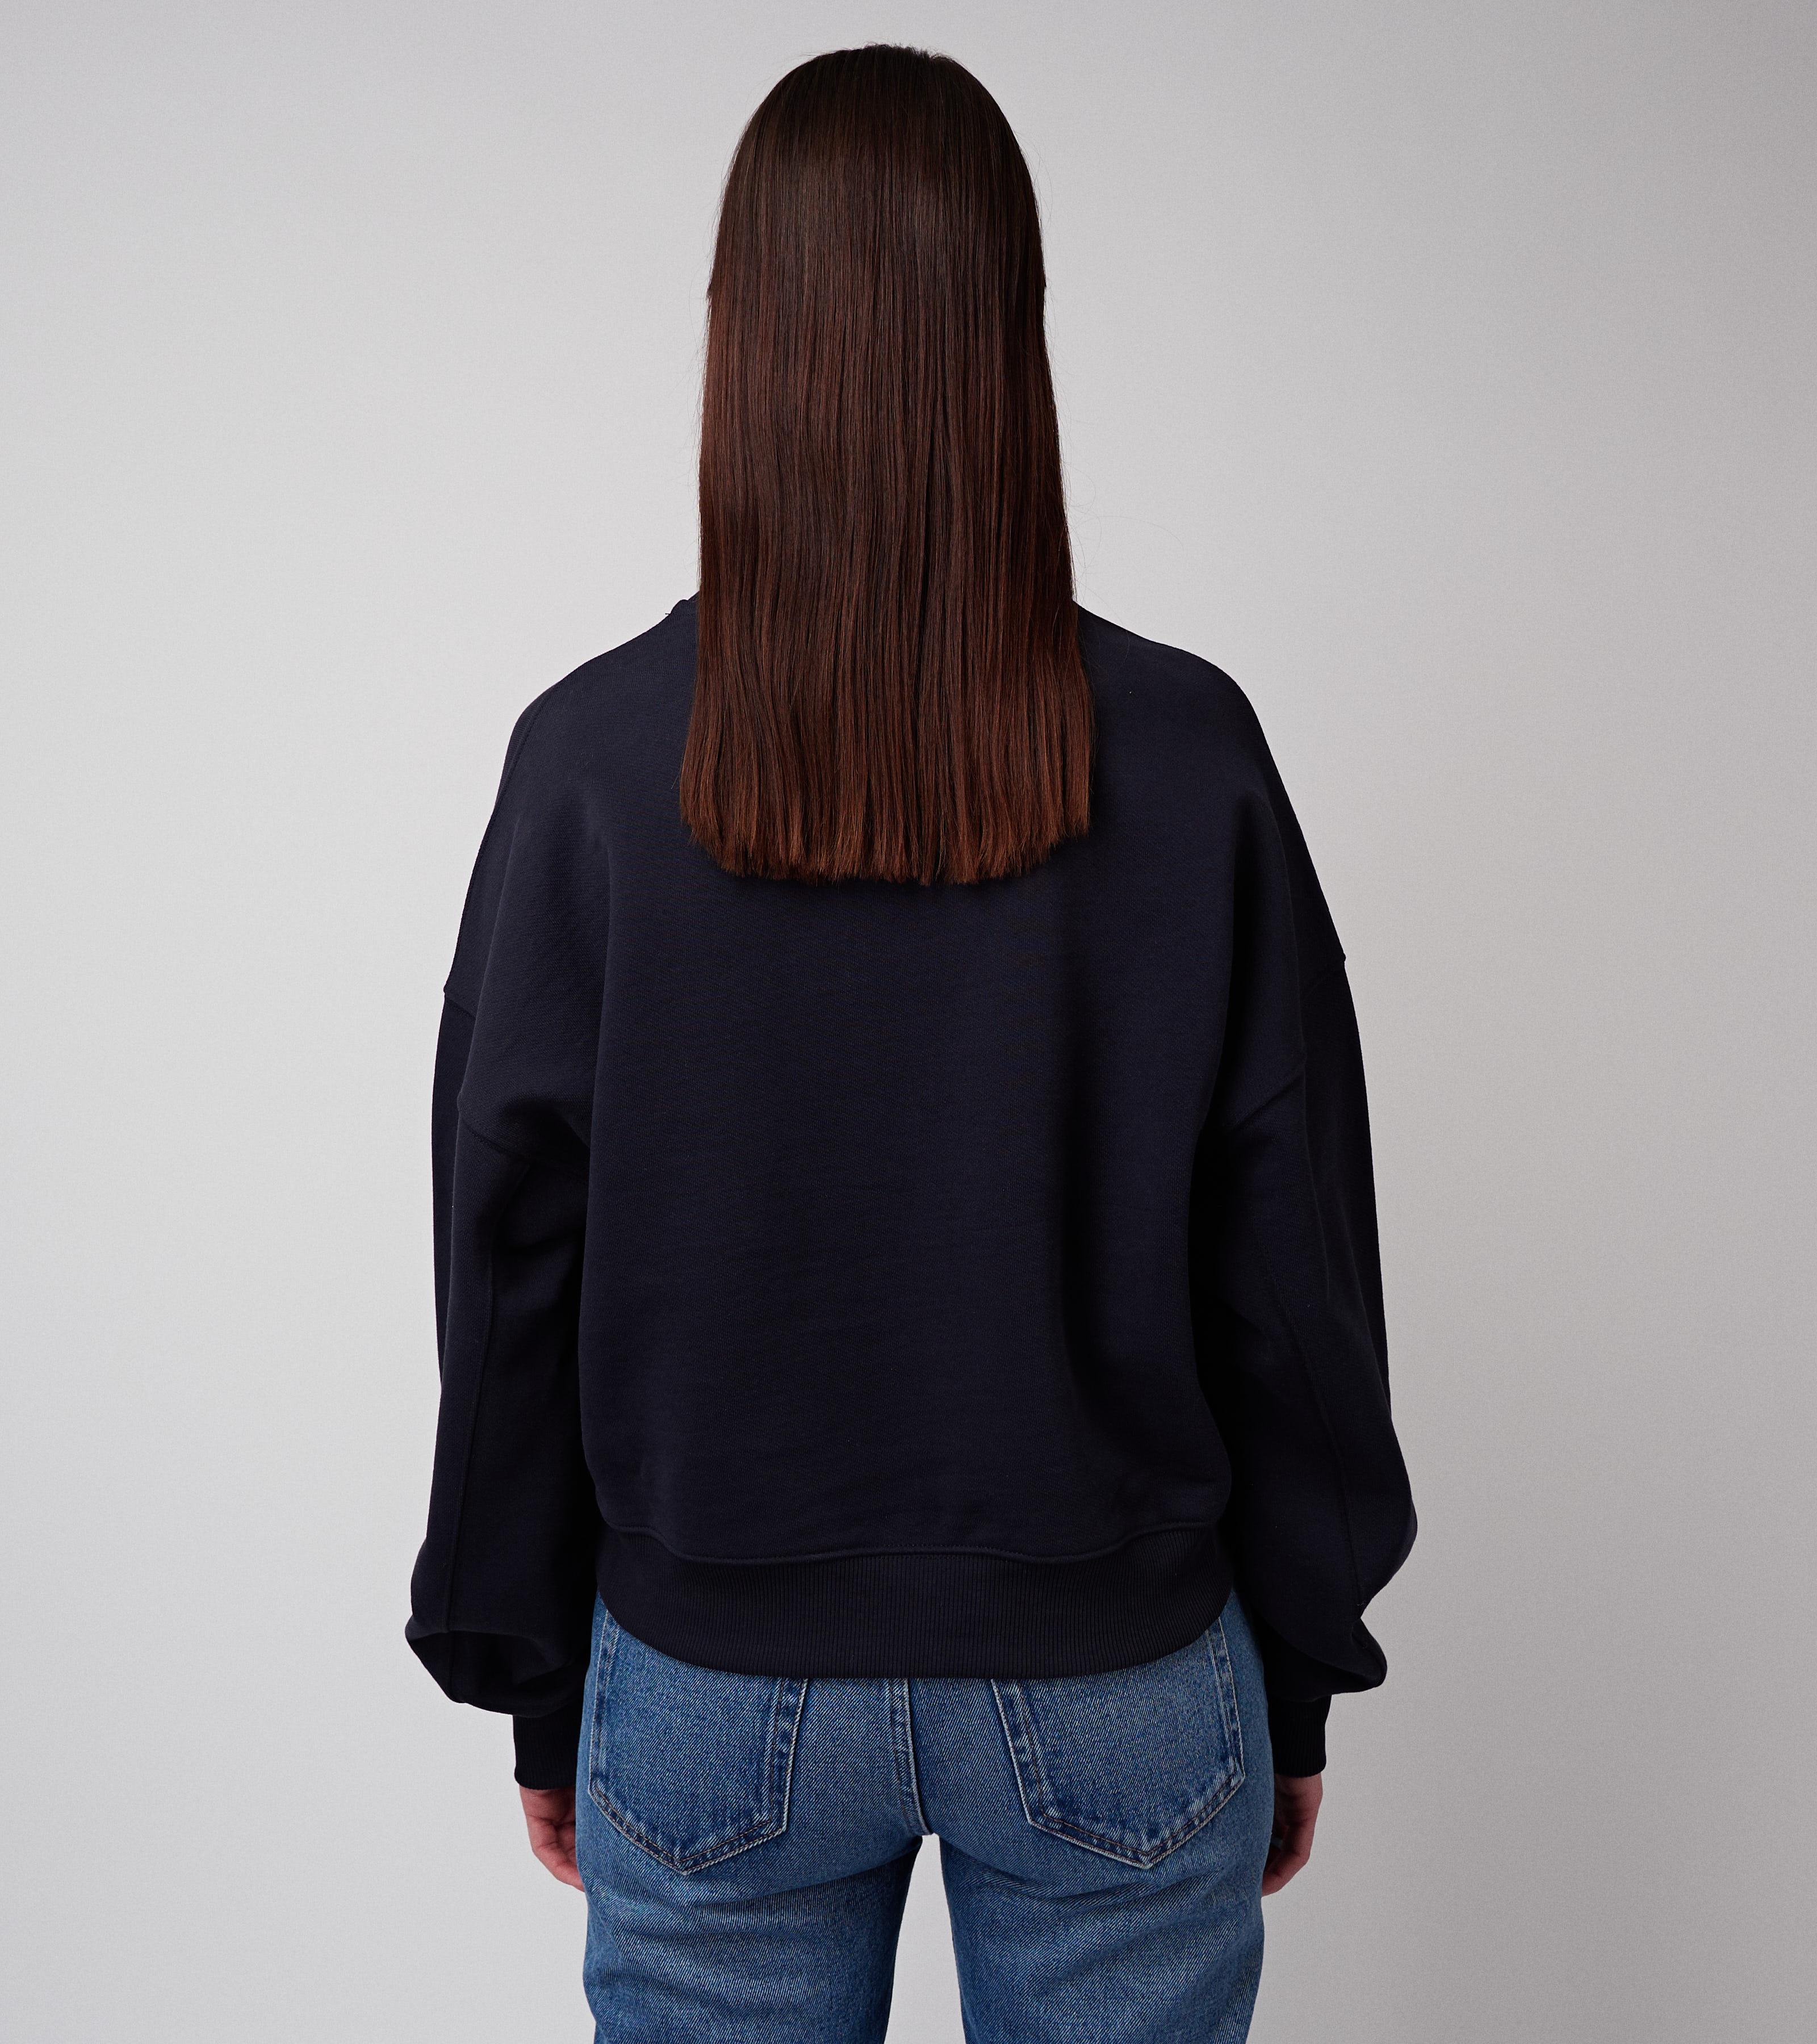 Mira Beach Sweater Pistol Black